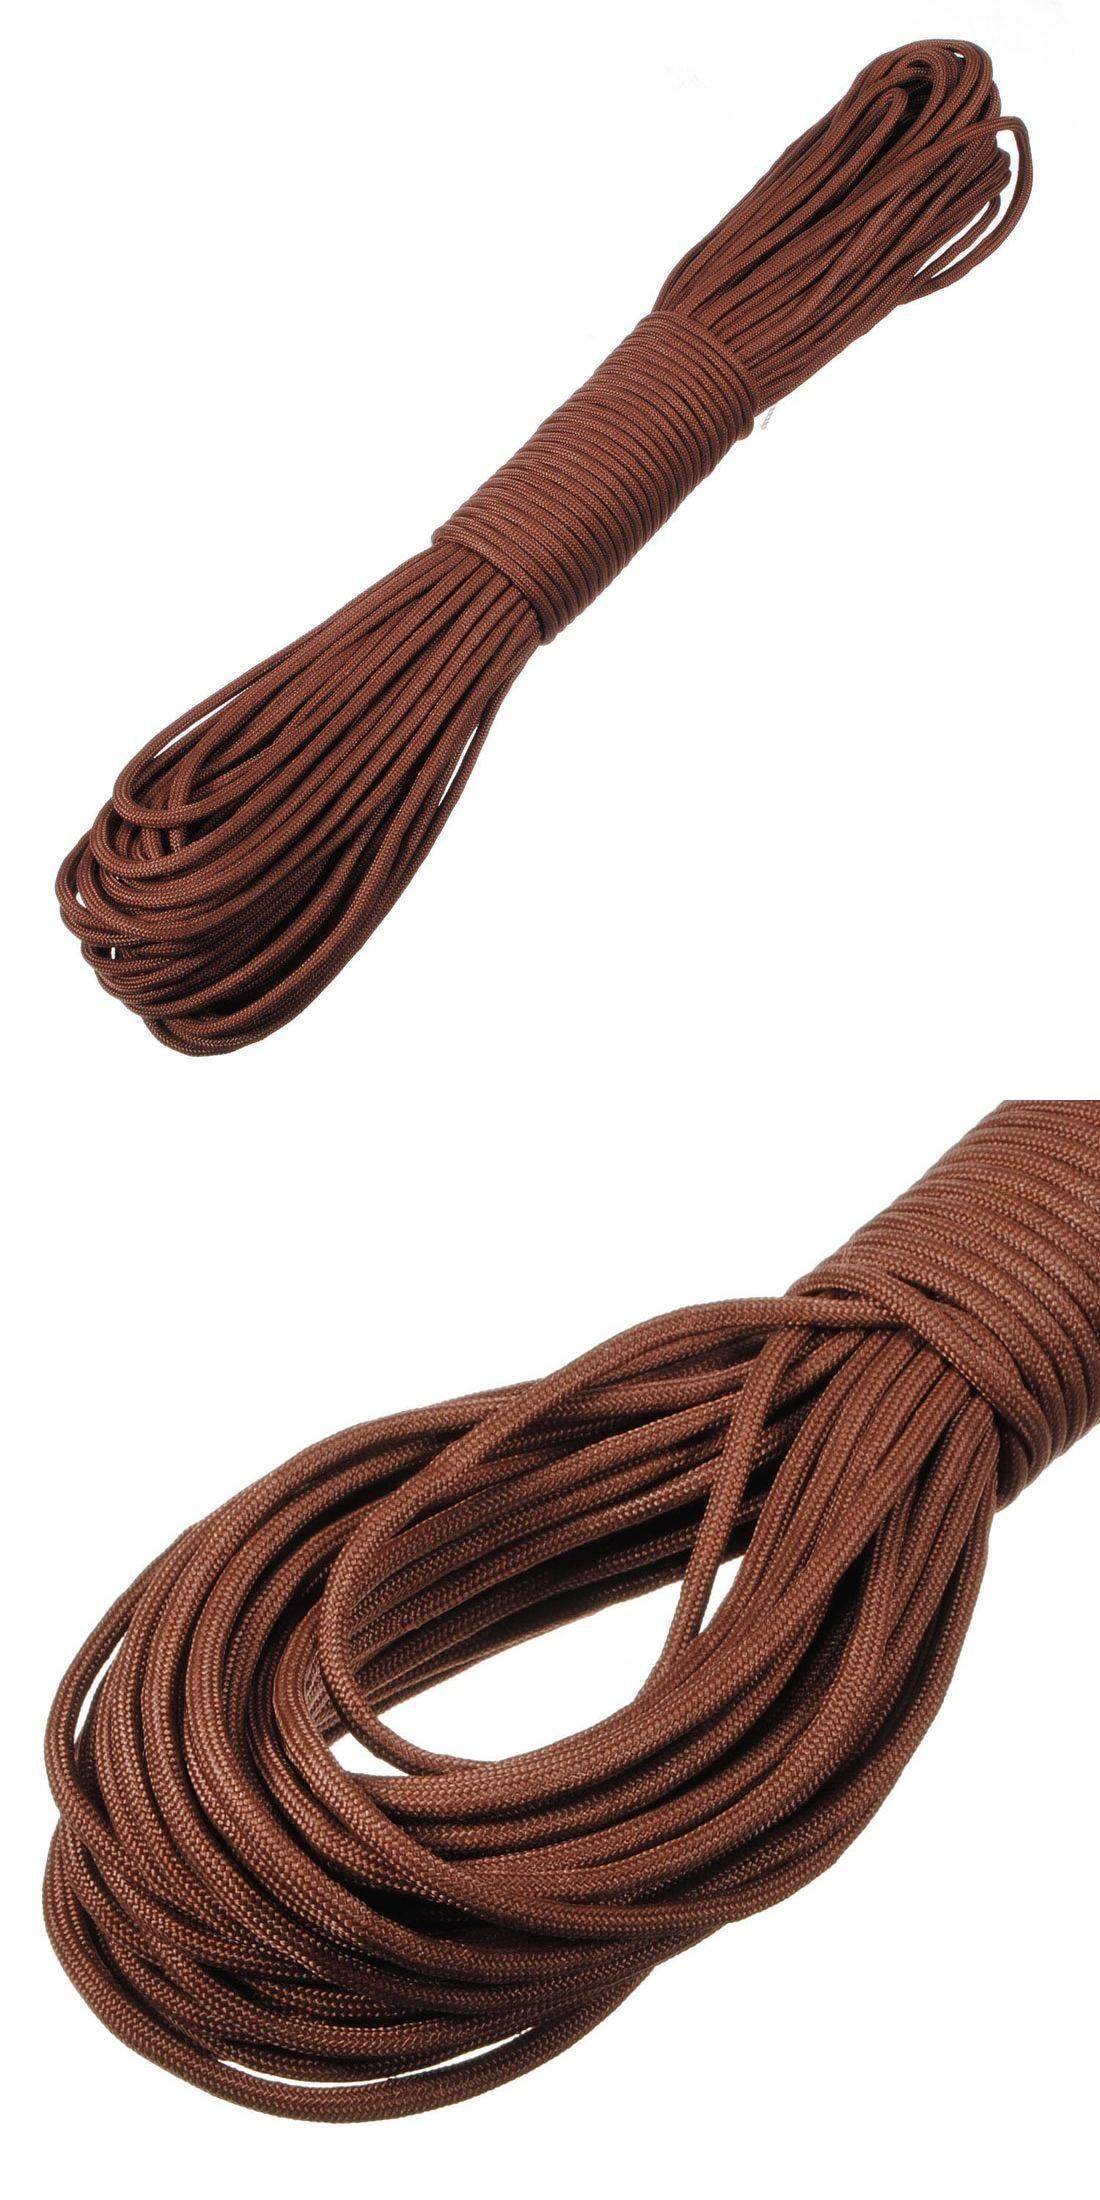 Visit to Buy] Parachute Rope Paracord bracelet Nylon 550 30.5 m 100 ...